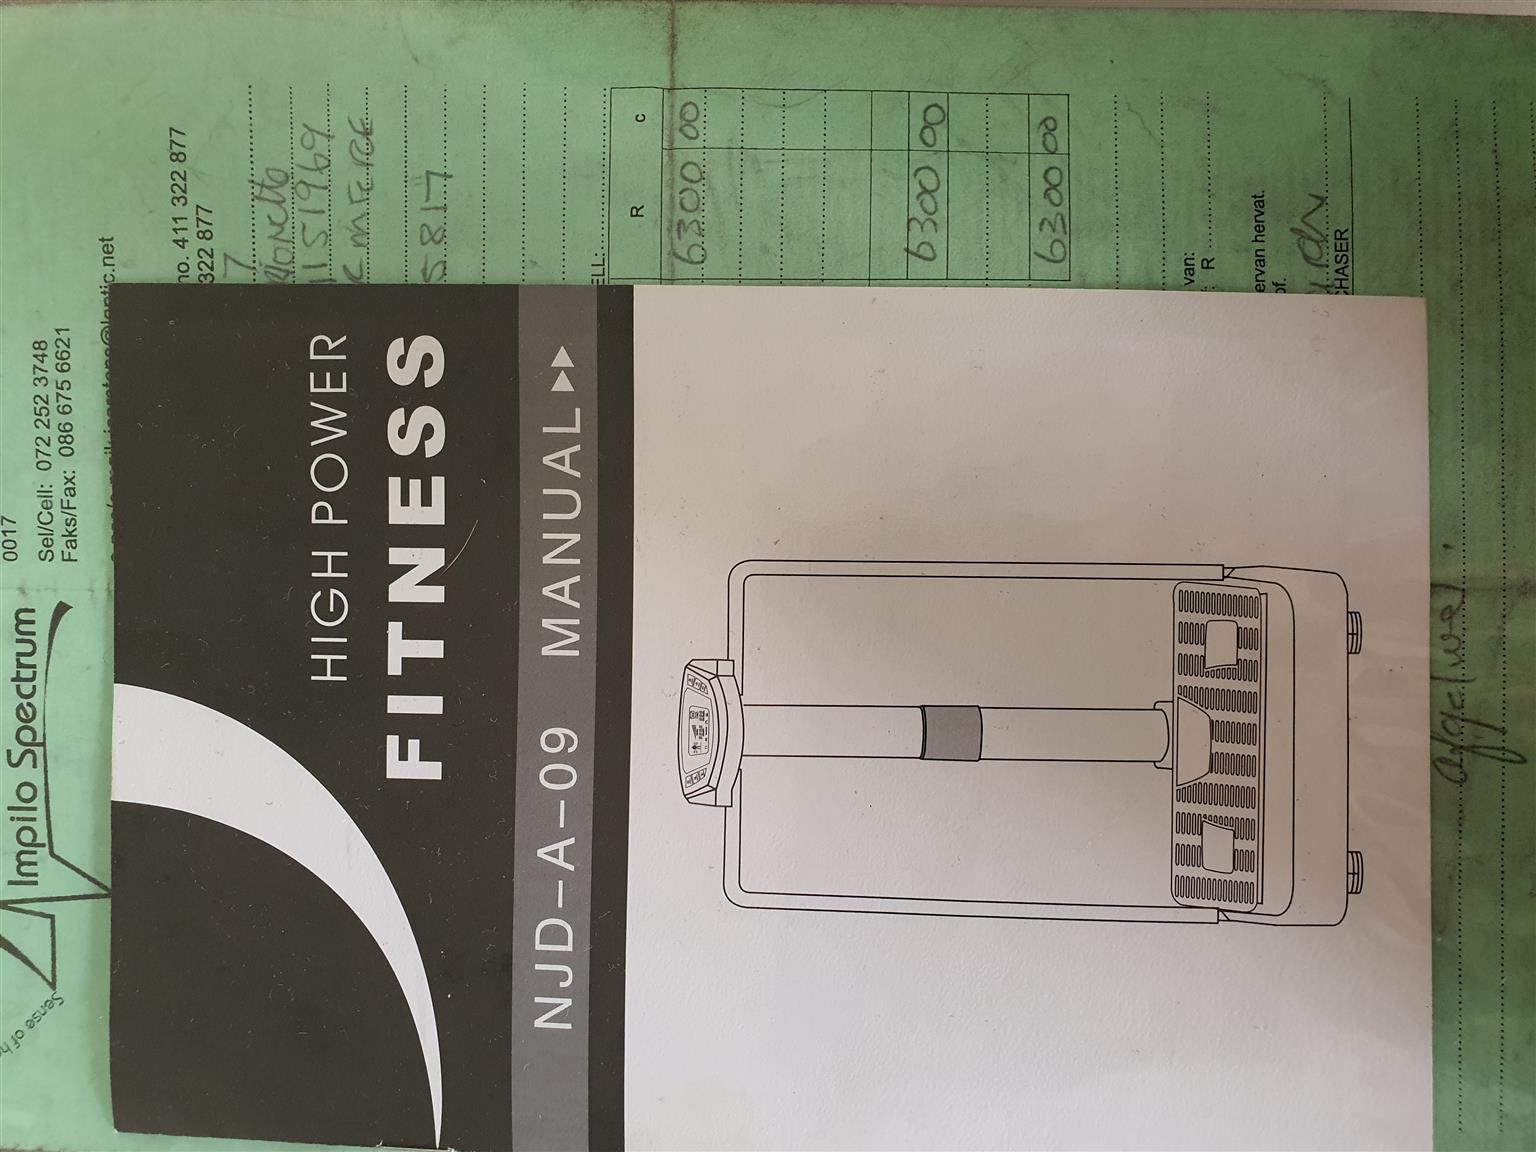 Vibration Slimming & Fitness Machine